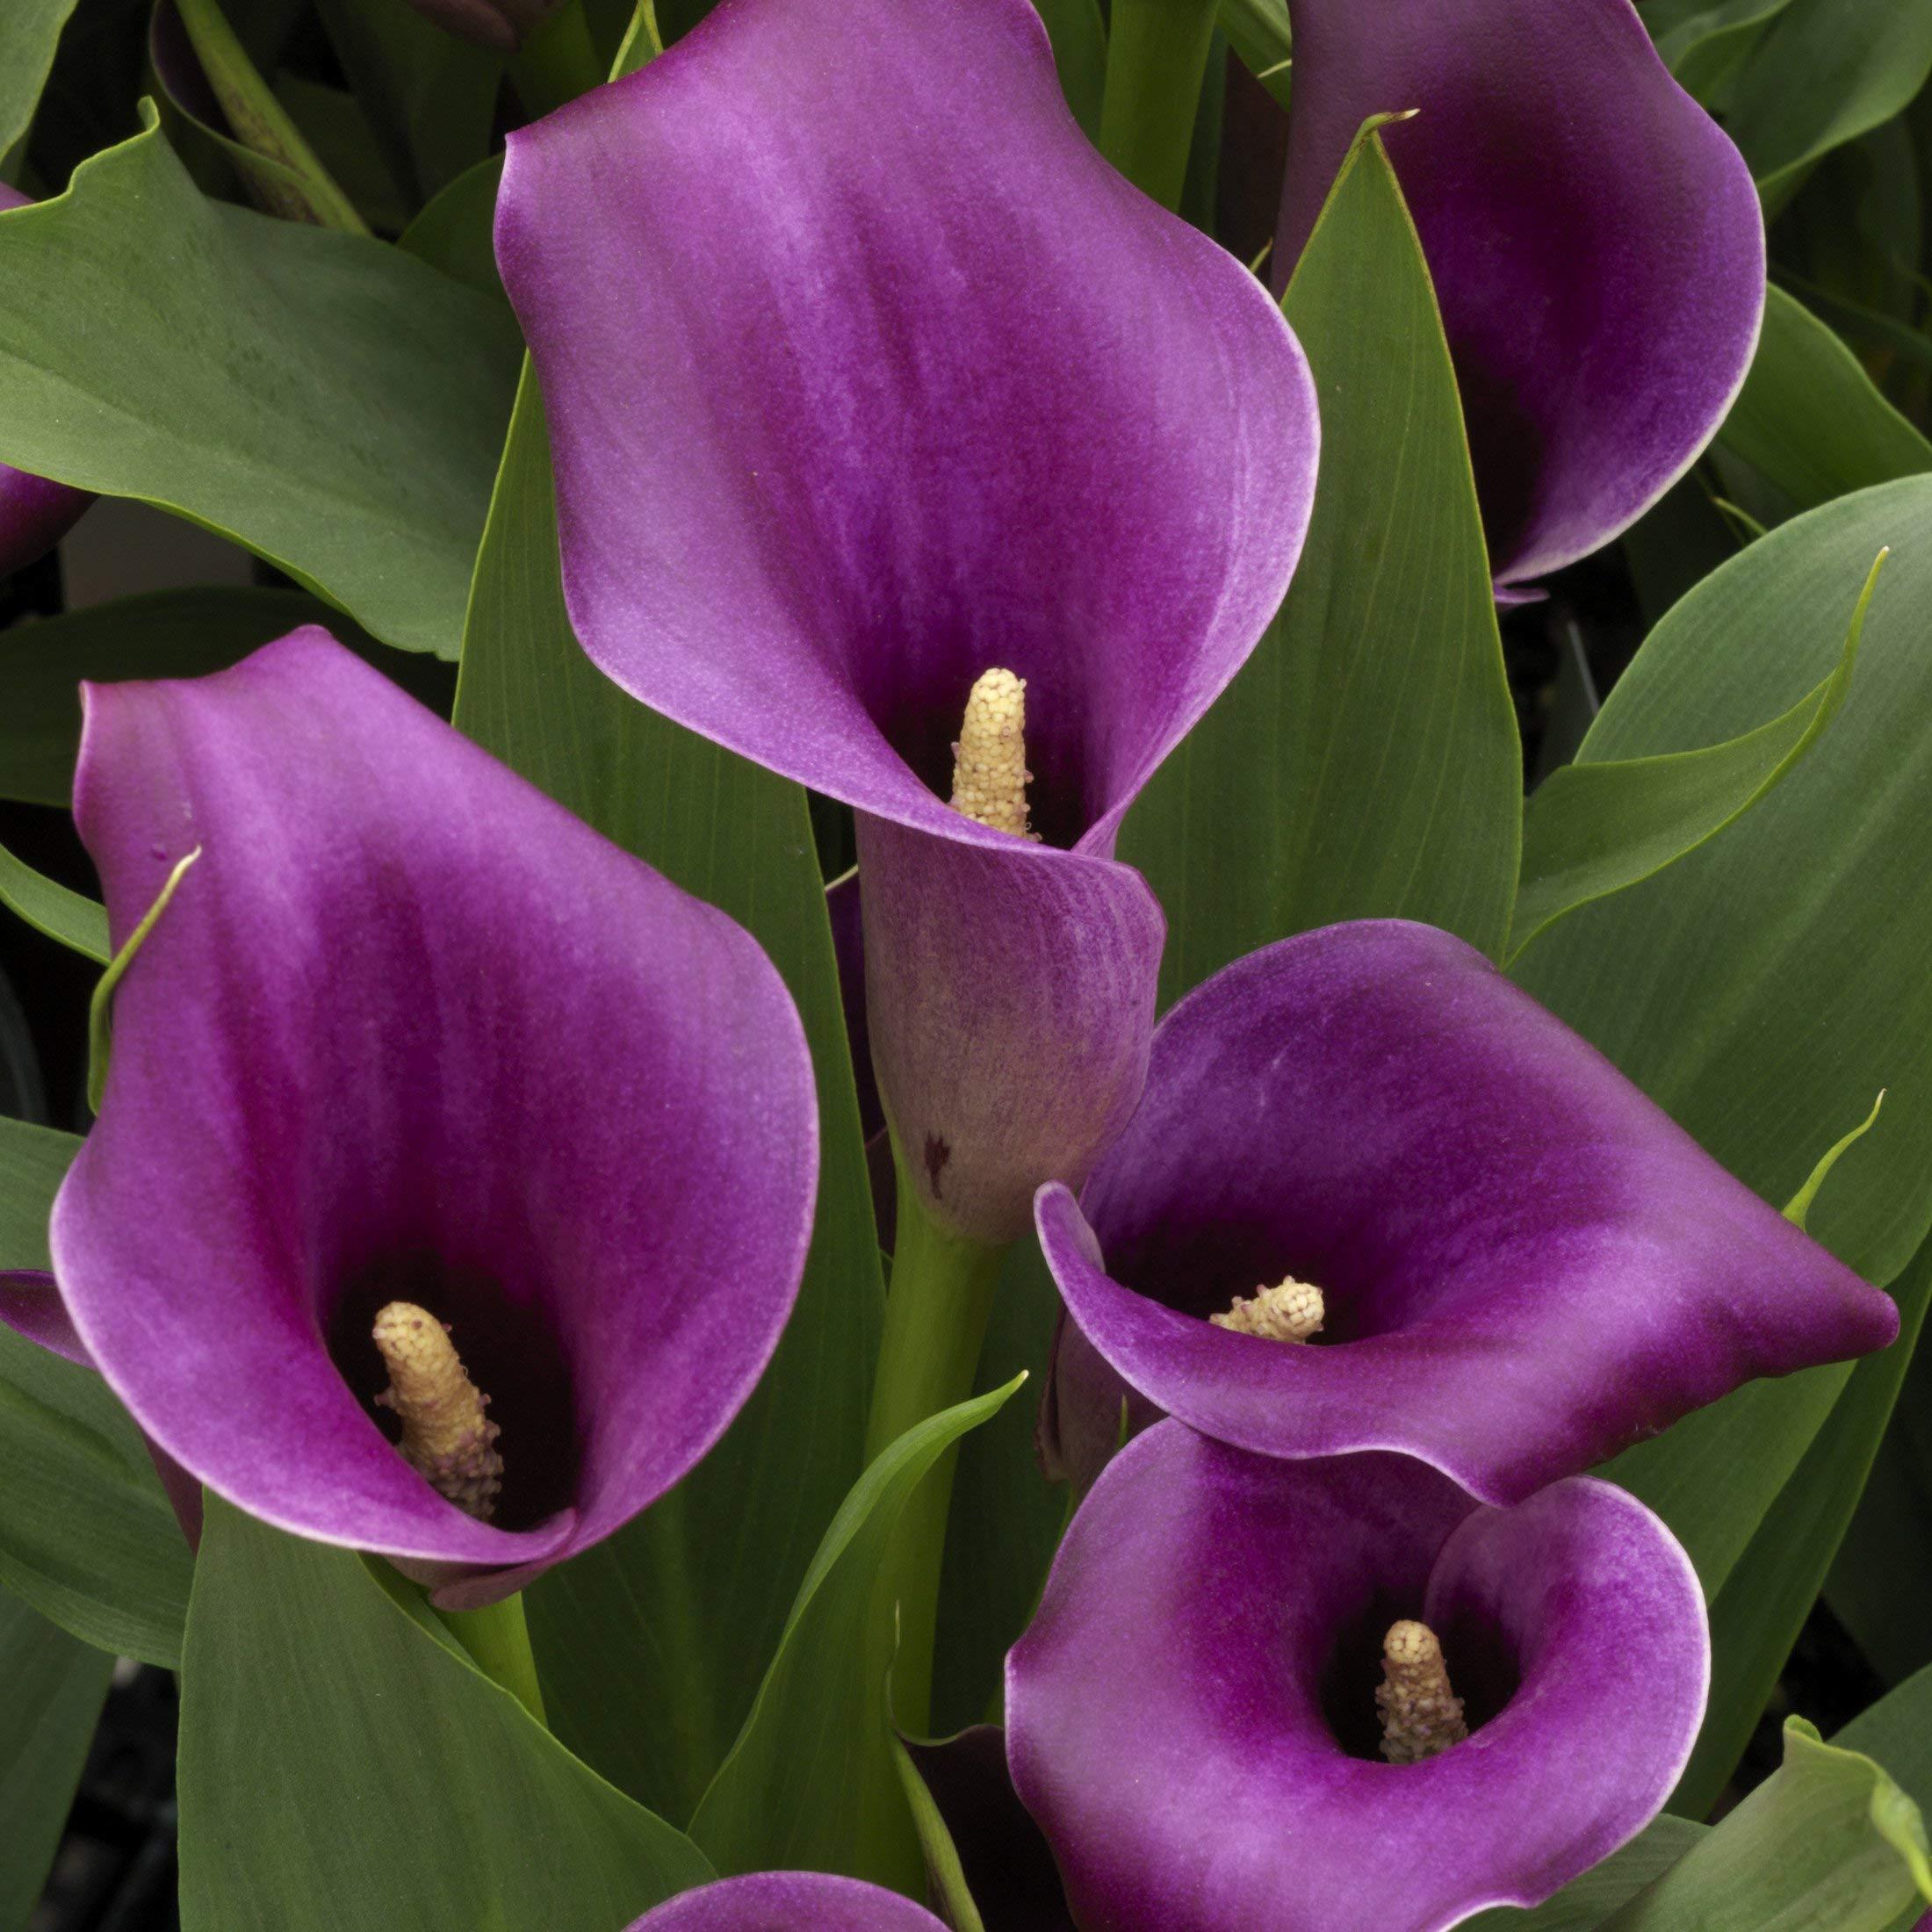 Purple Calla Lily Bulbs-10 Bulbs-Pretty Calla Lily Bulbs Zantedeschia Flowers Wedding Bouquet Decoration Bonsai Garden Planting by okdress